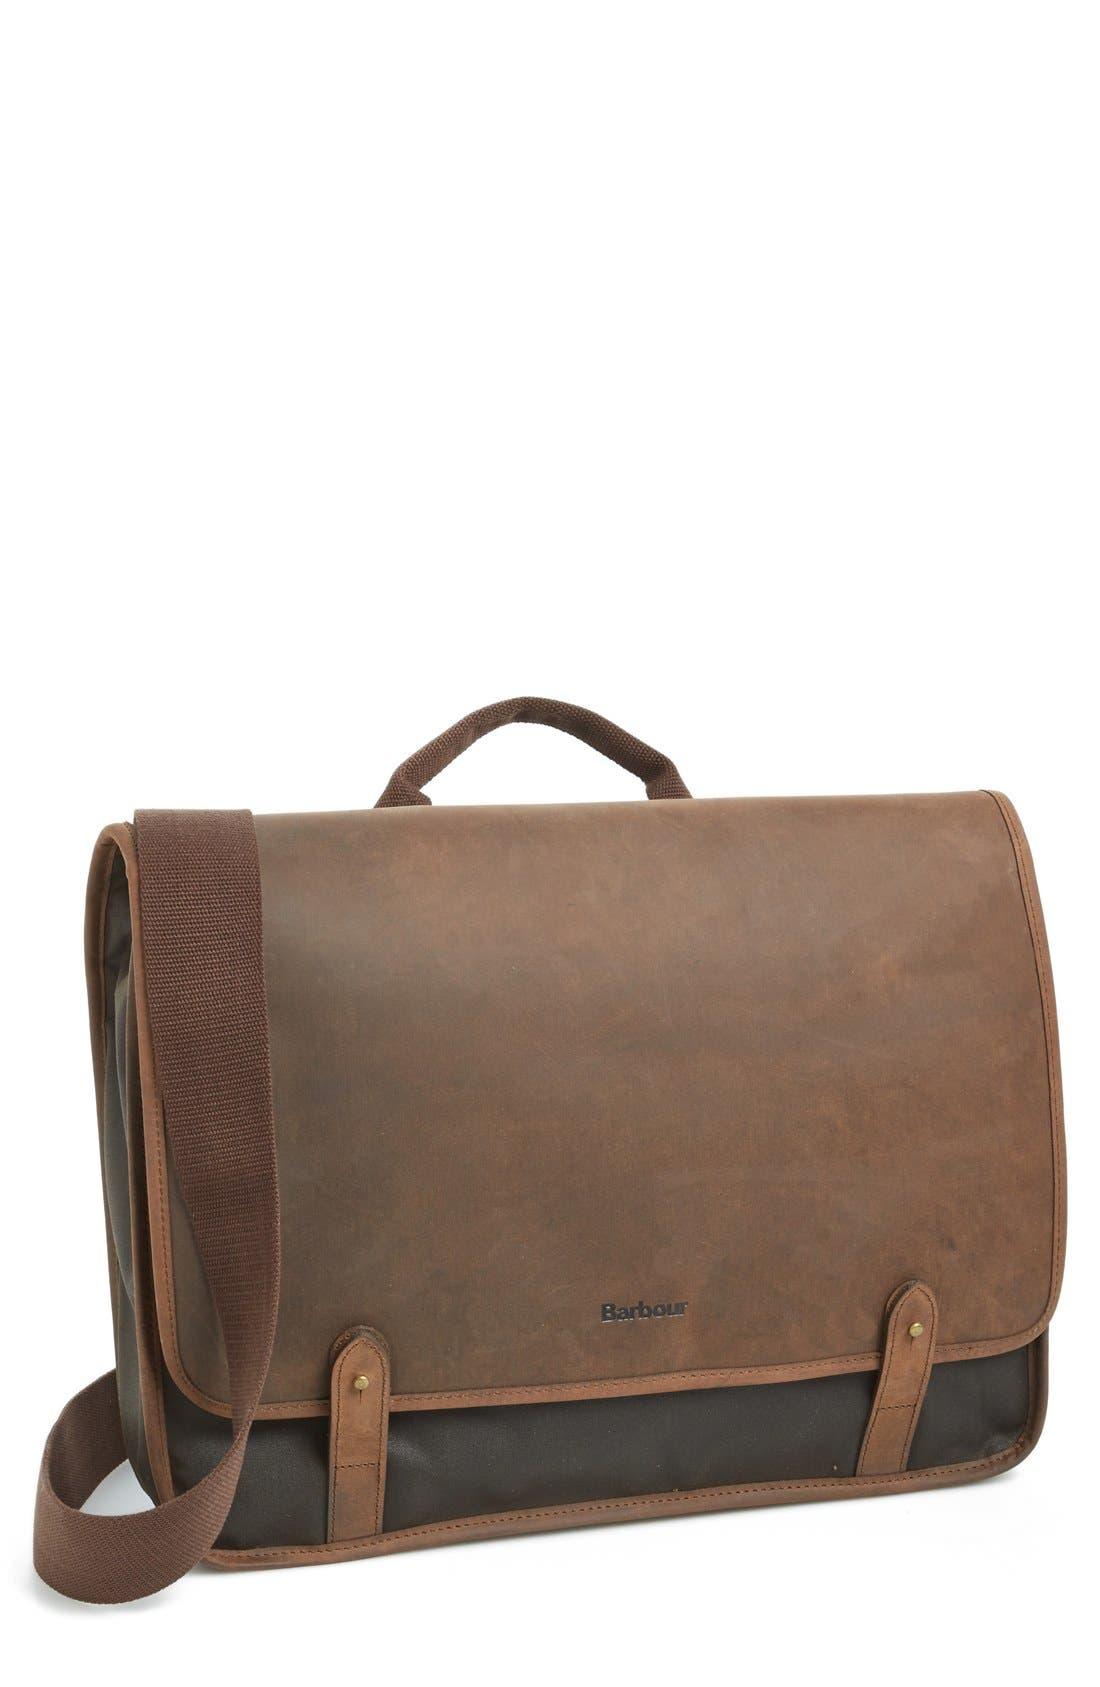 BARBOUR,                             Waxed Canvas & Leather Messenger Bag,                             Main thumbnail 1, color,                             340